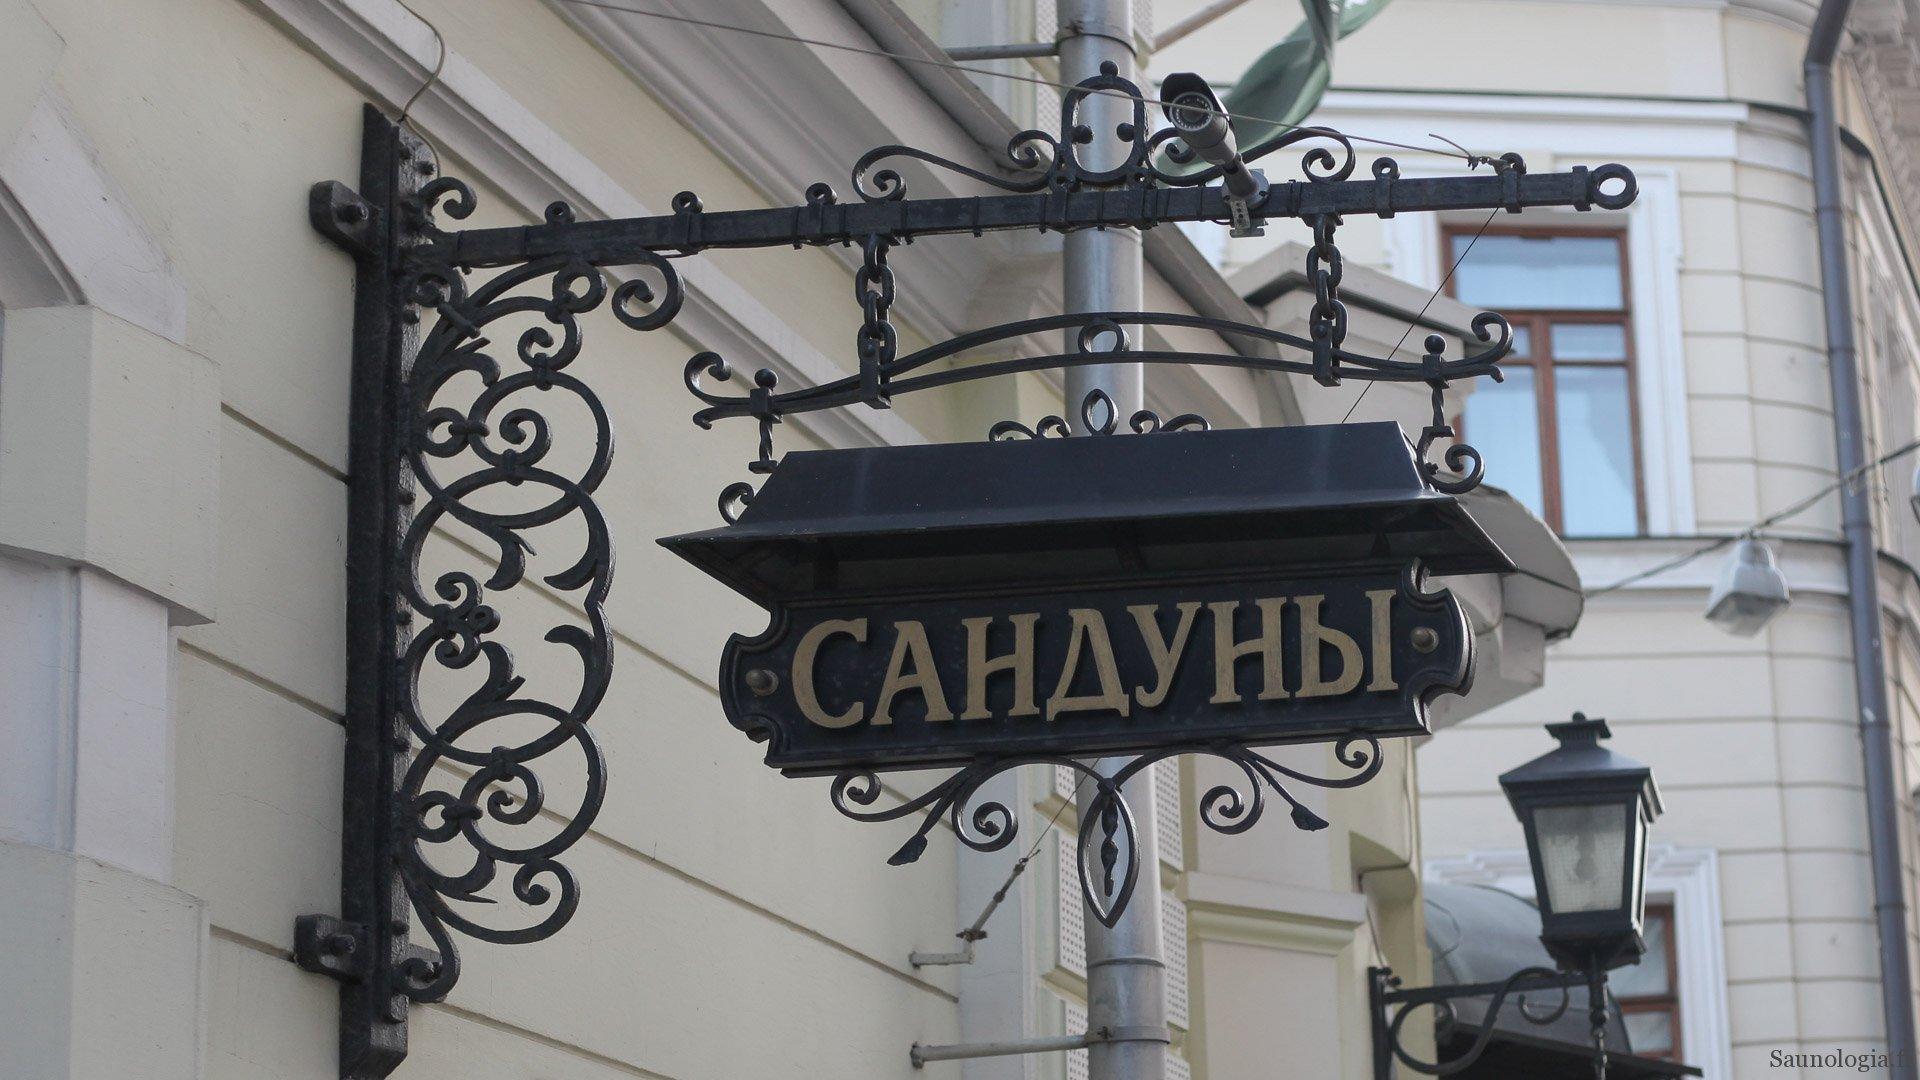 171003-moscow-sanduny-street-sign